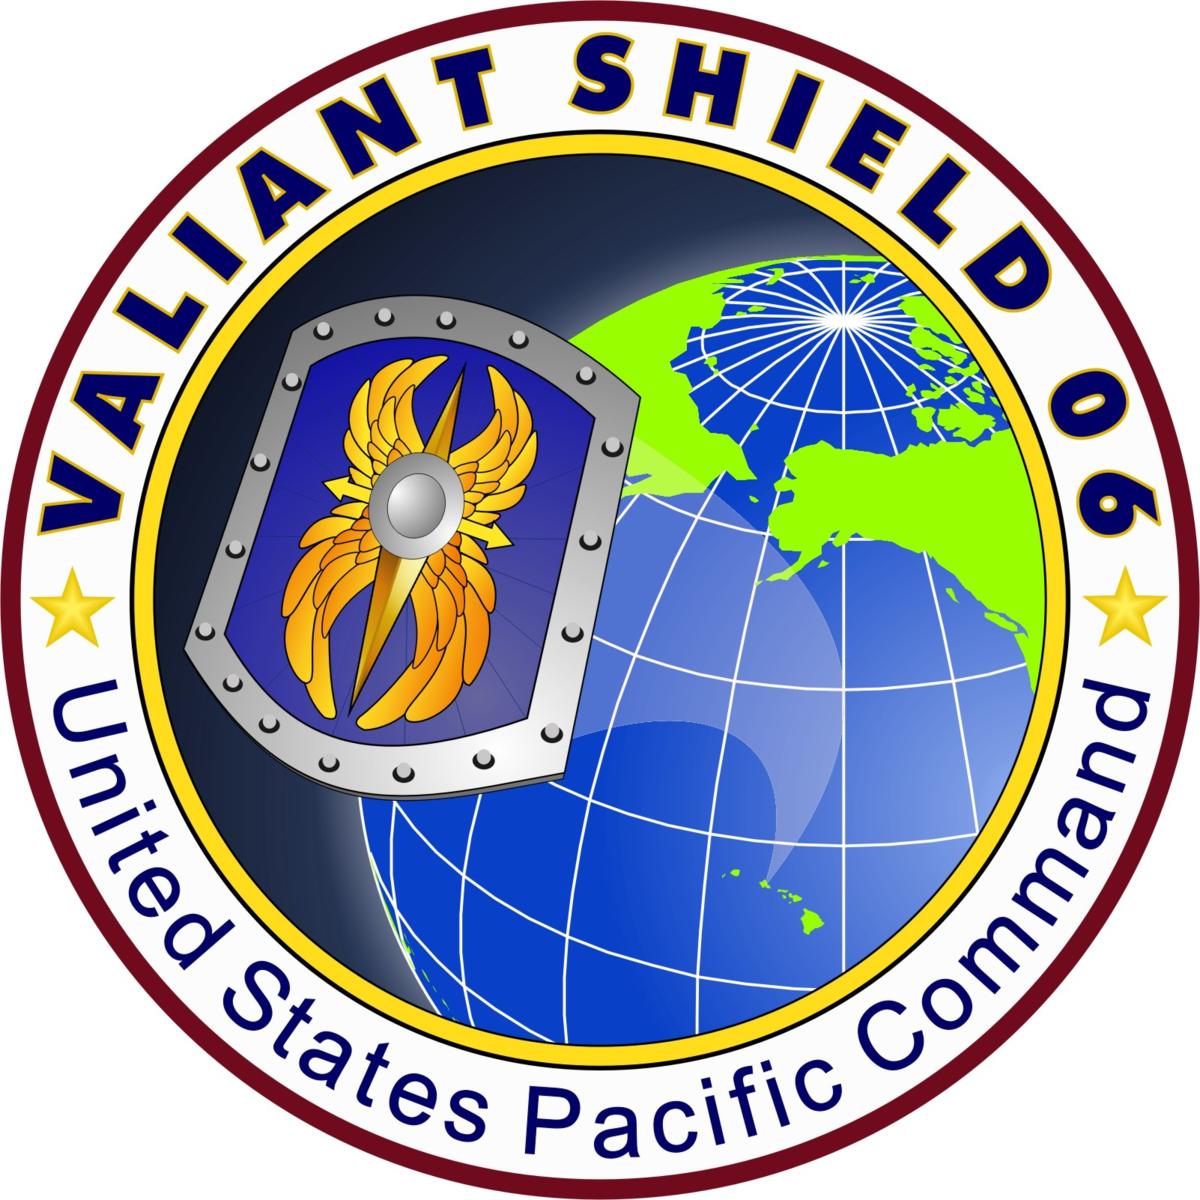 Exercise Valiant Shield Wikipedia